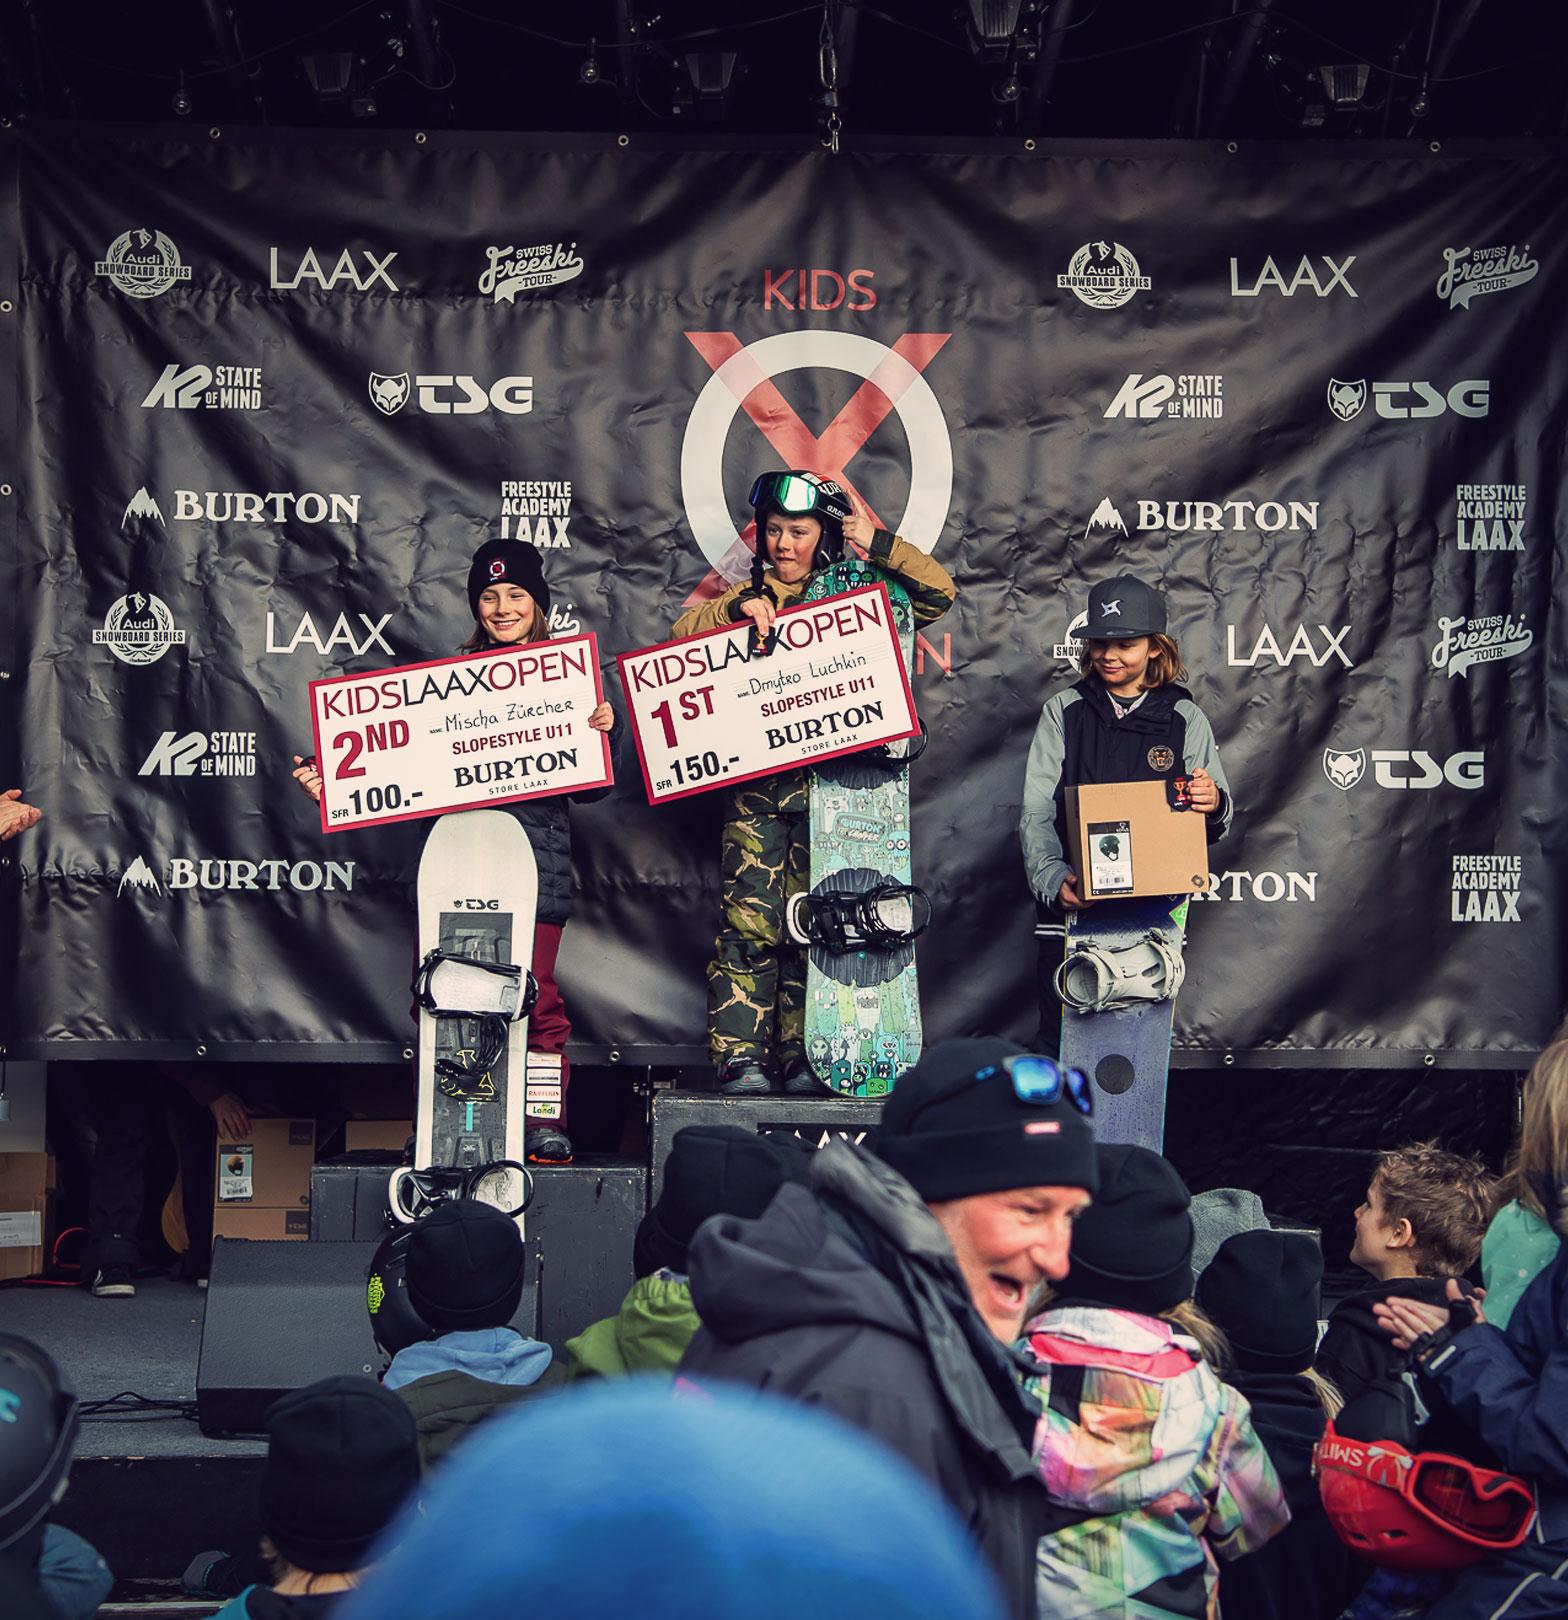 TSG Kids Kids Laax Open 2019 snowpark laax podium Mischa Zürcher